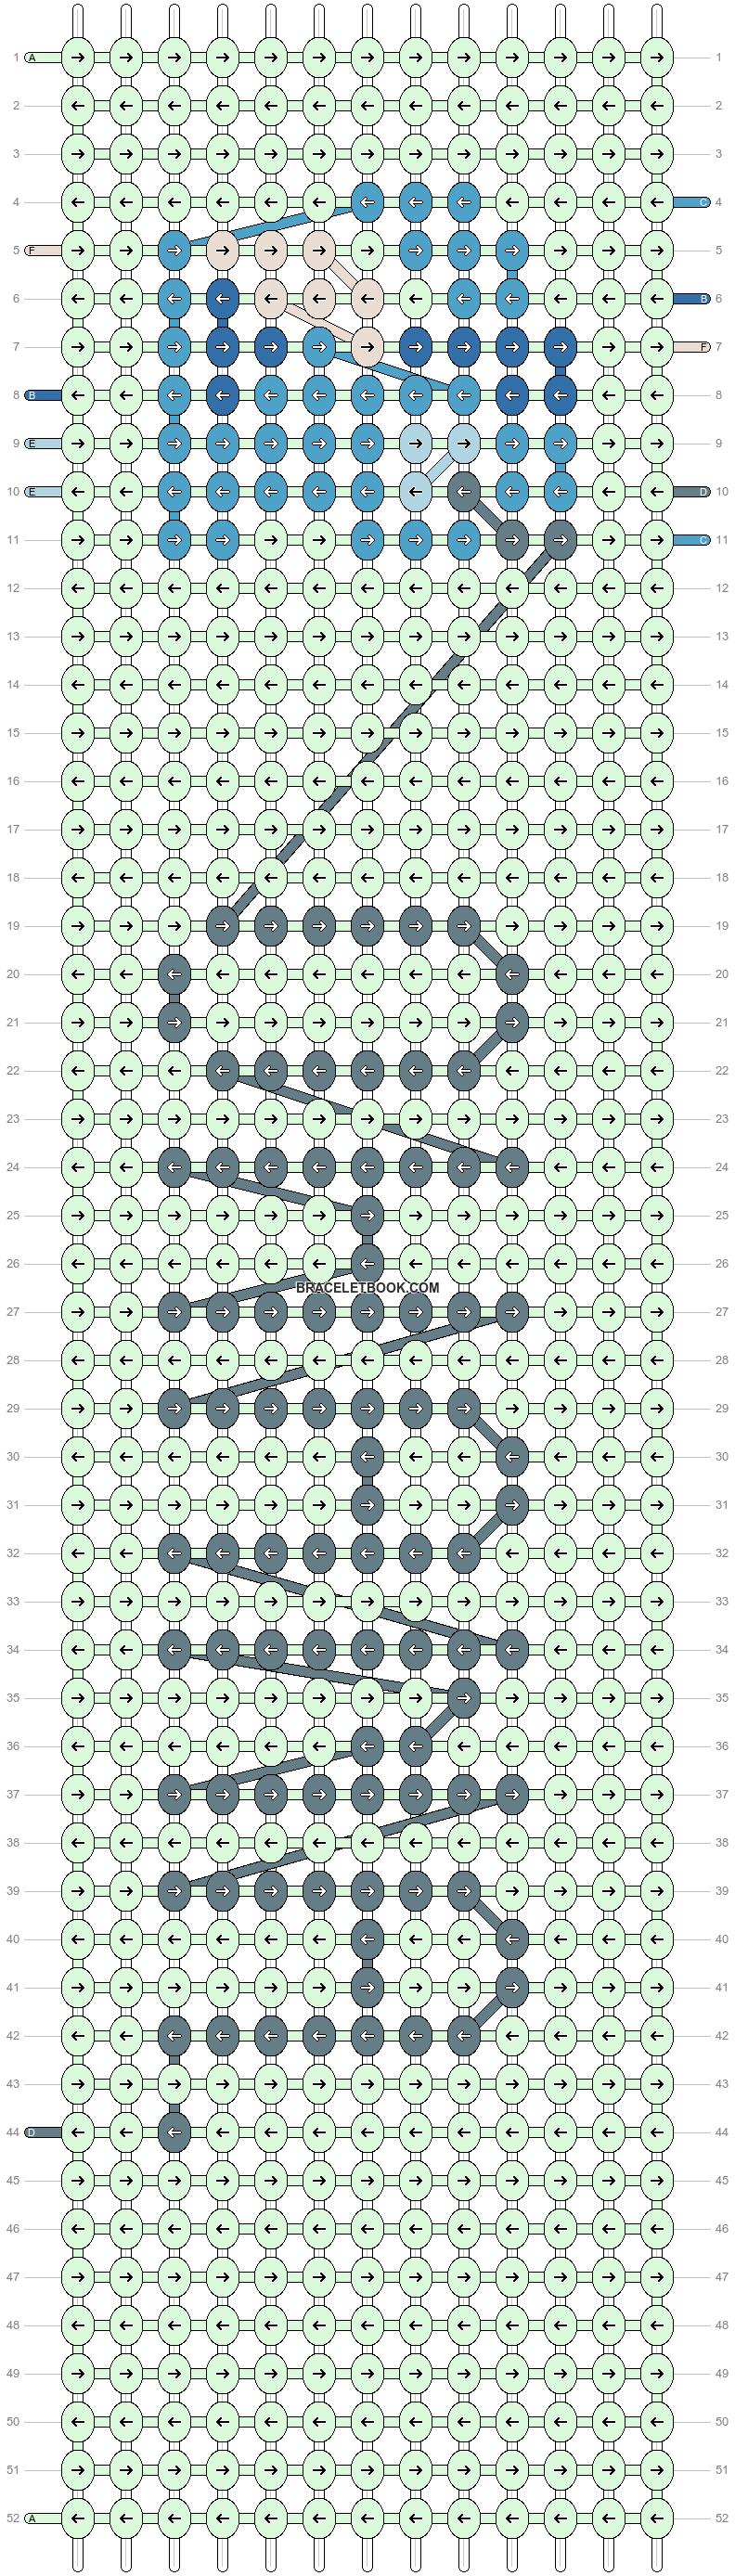 Alpha pattern #11985 pattern